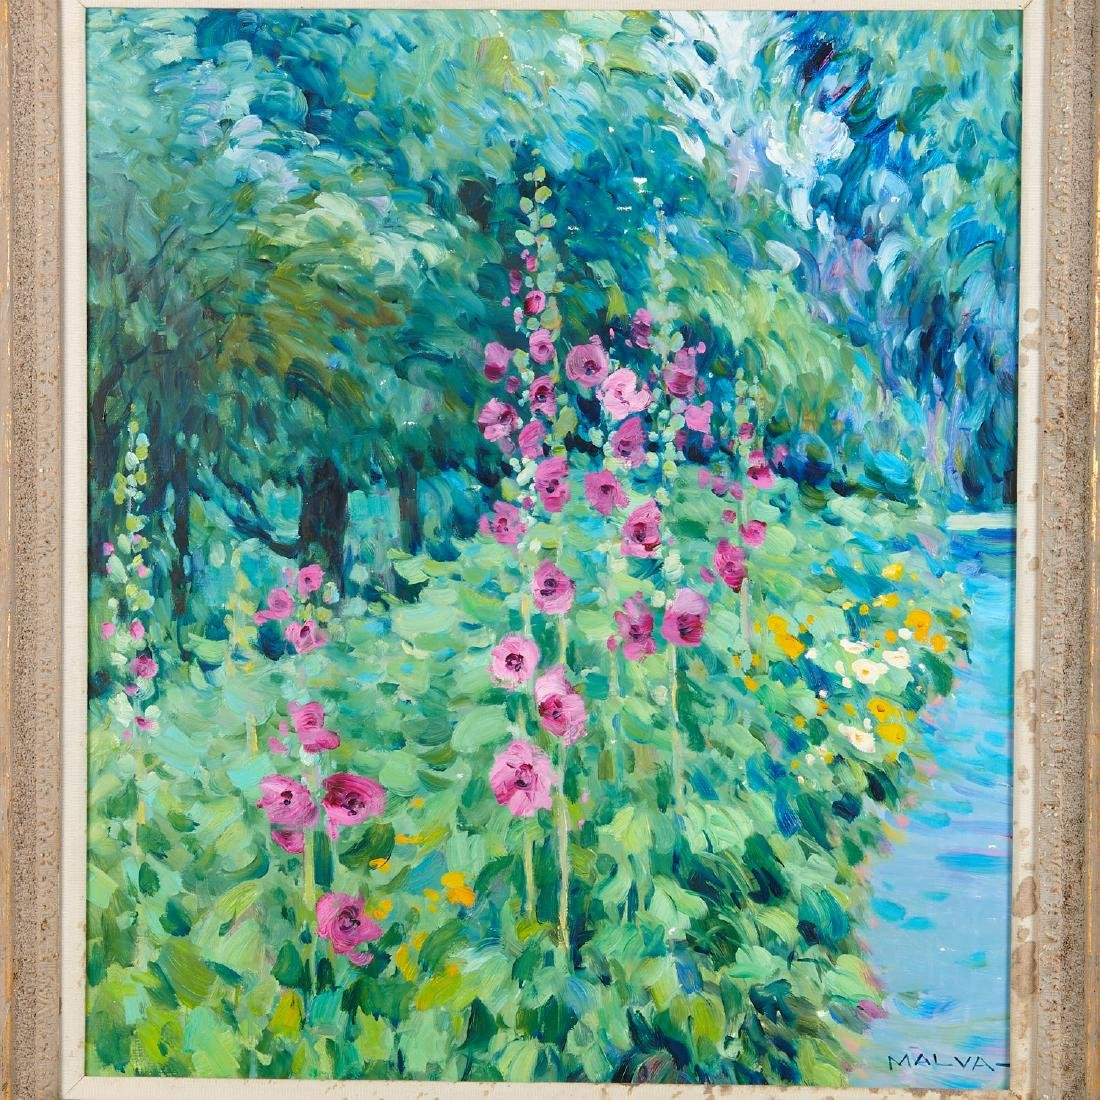 Malva, painting - 2